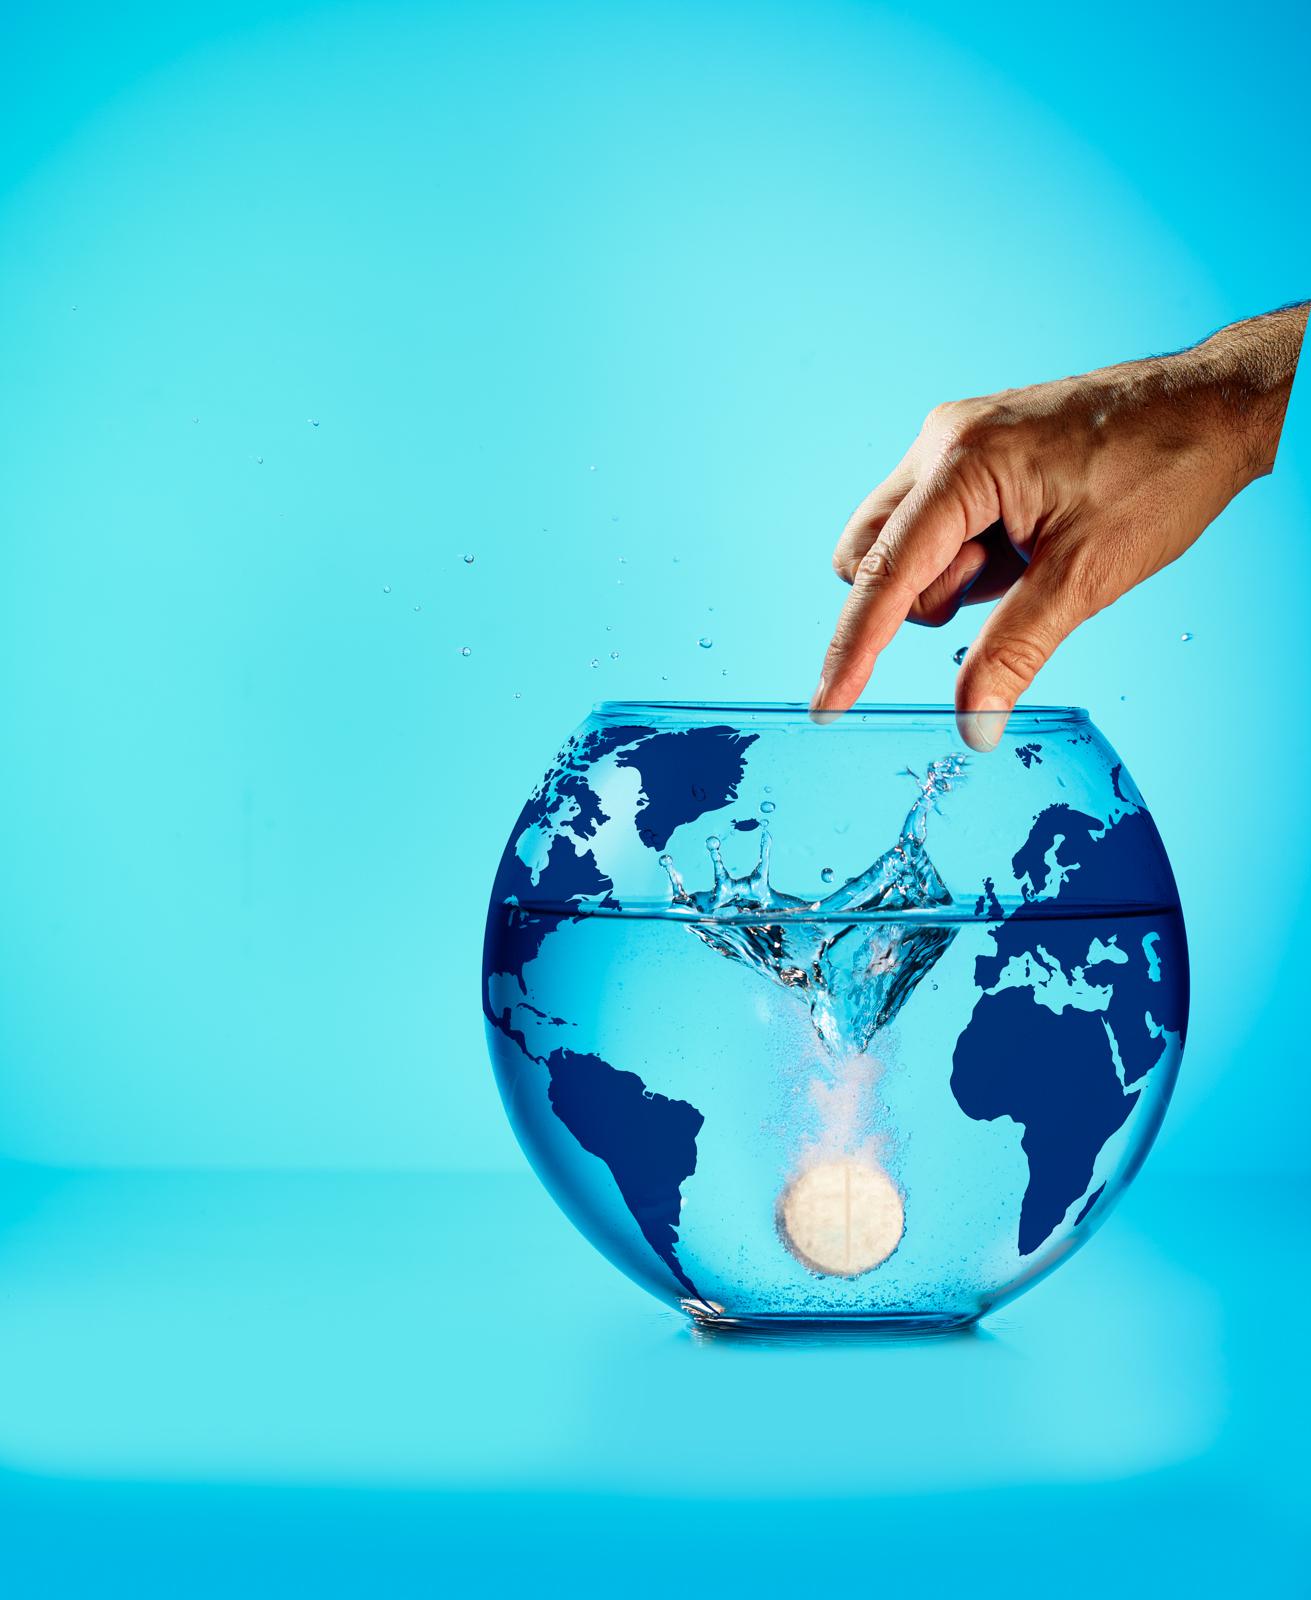 Illutstration Sauvez Les Oceans - Science & Vie junior